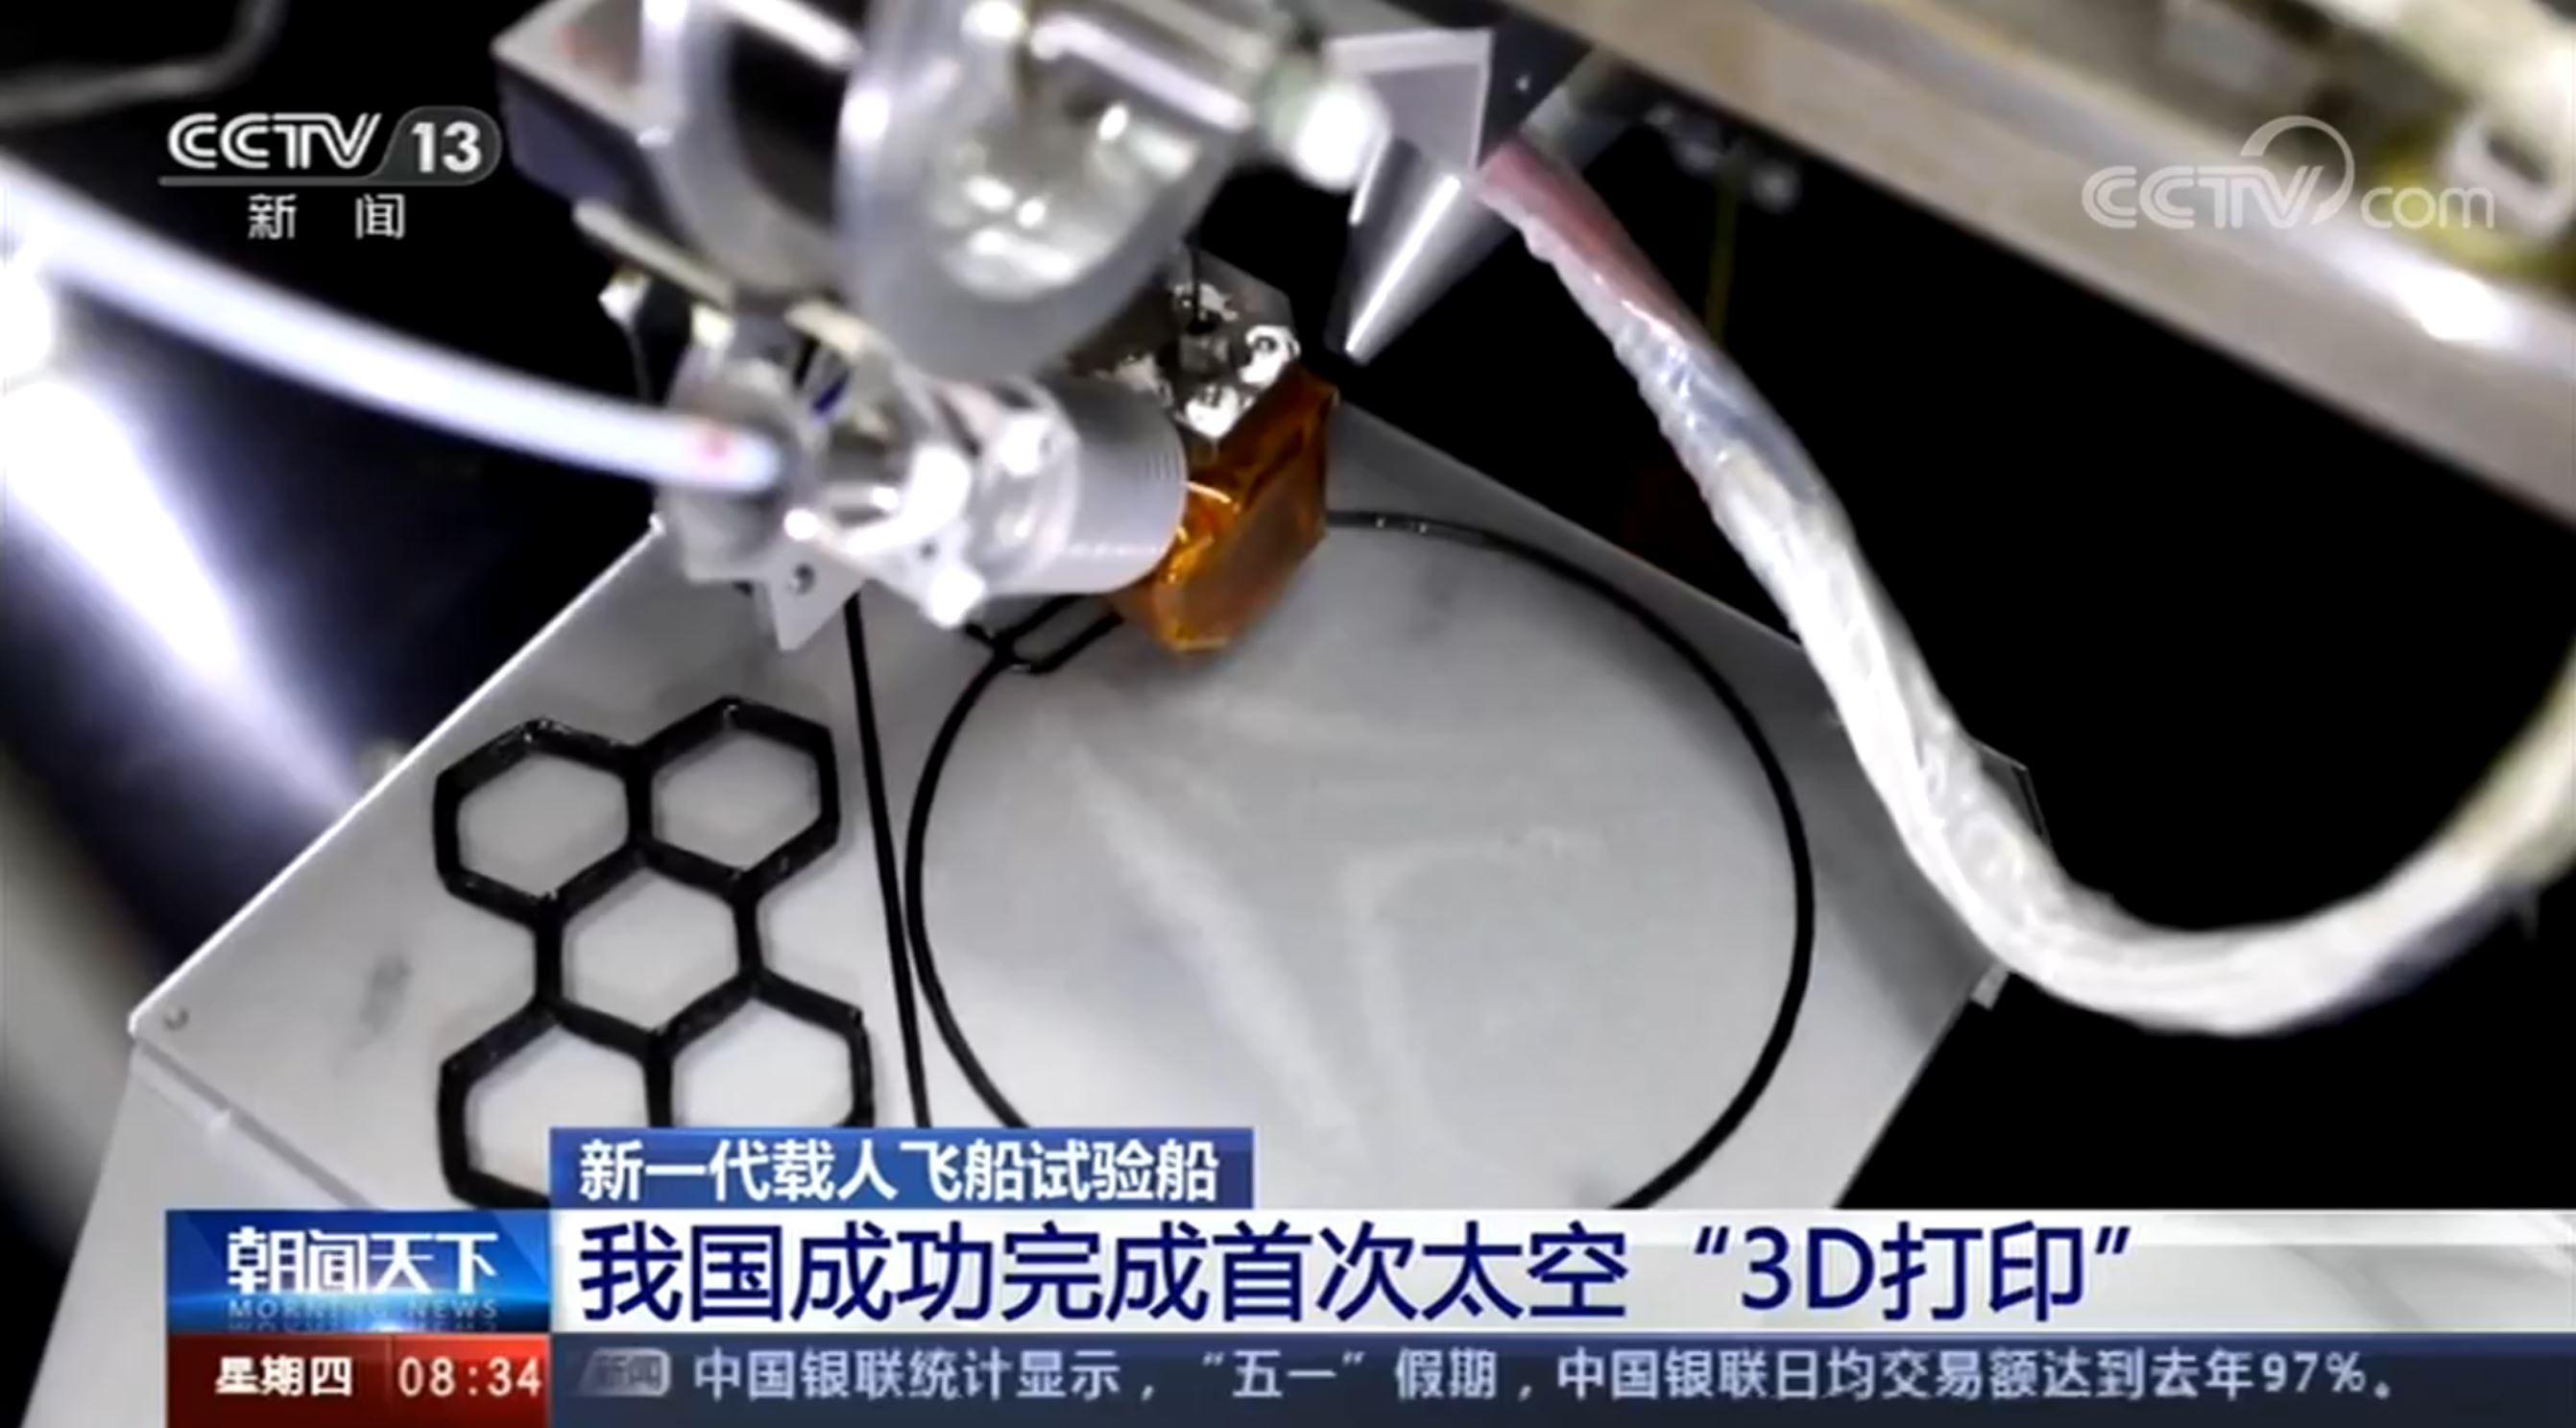 2020-7-may-chinese-spacecraft-4.jpg